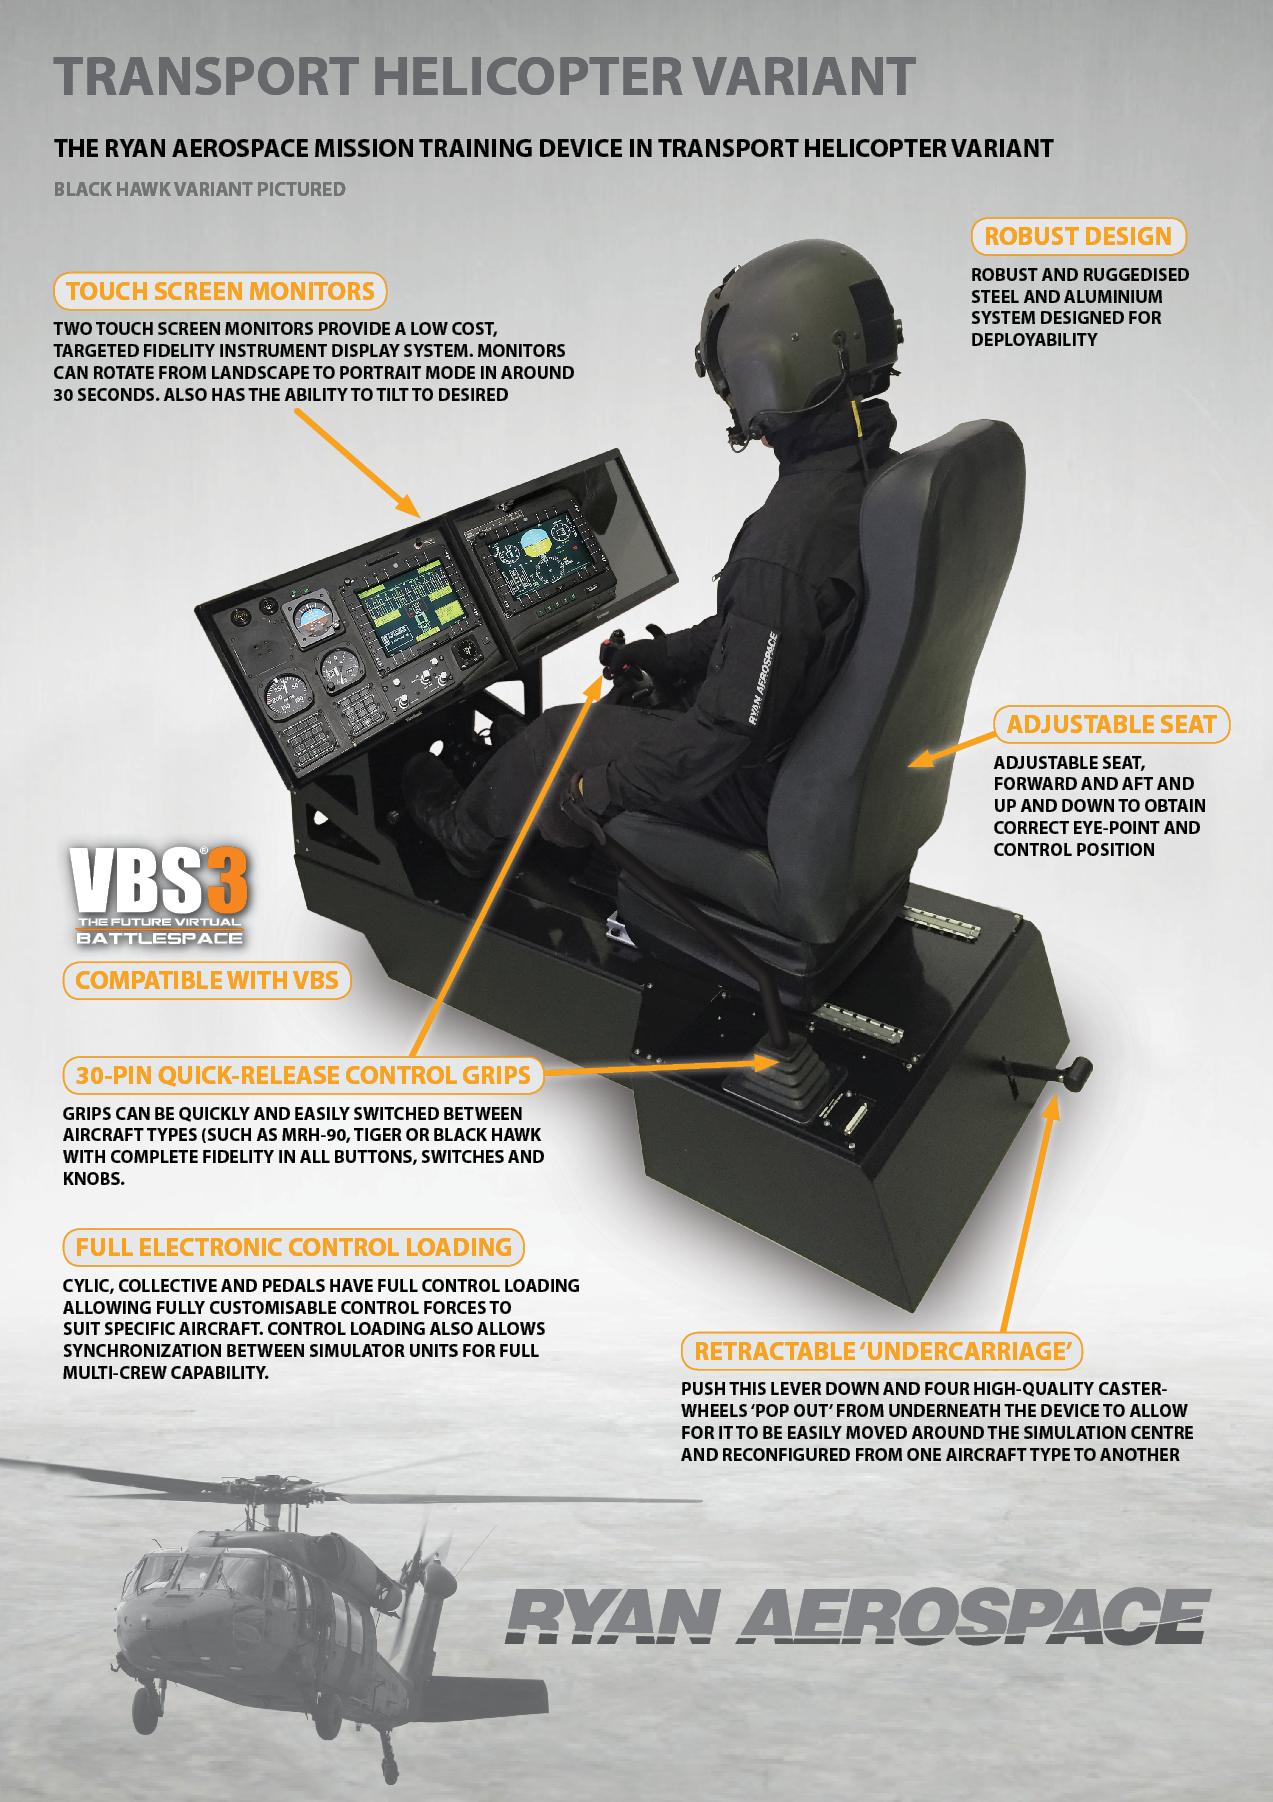 Ryan Aerospace Mission Trainer in Black Hawk variant